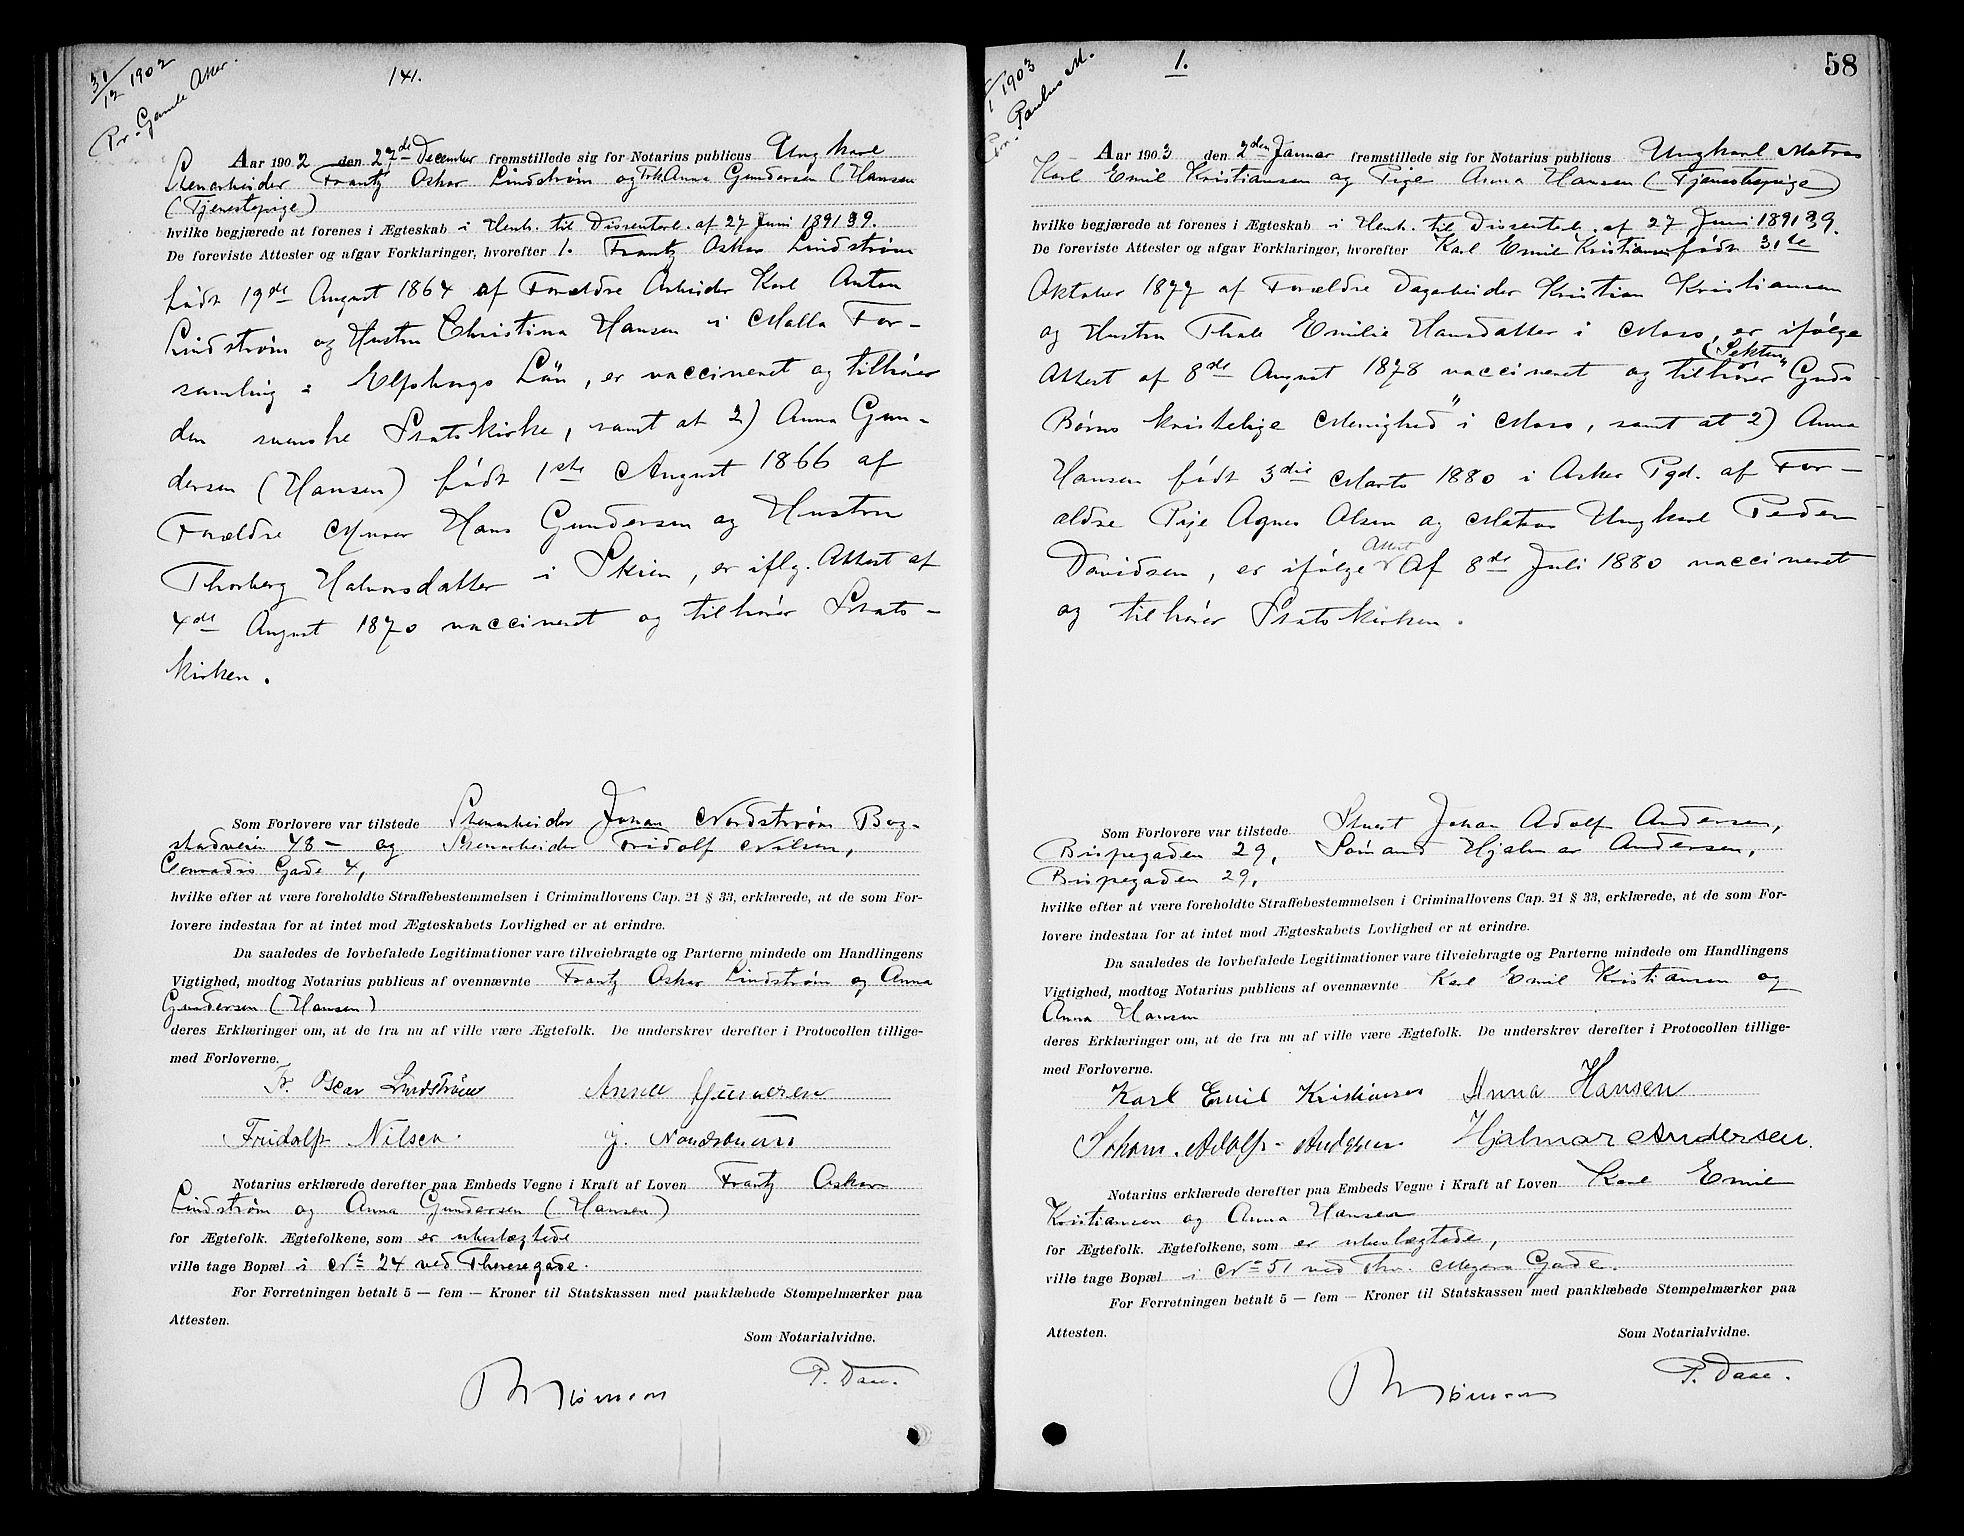 SAO, Oslo byfogd avd. I, L/Lb/Lbb/L0006: Notarialprotokoll, rekke II: Vigsler, 1902-1907, s. 57b-58a